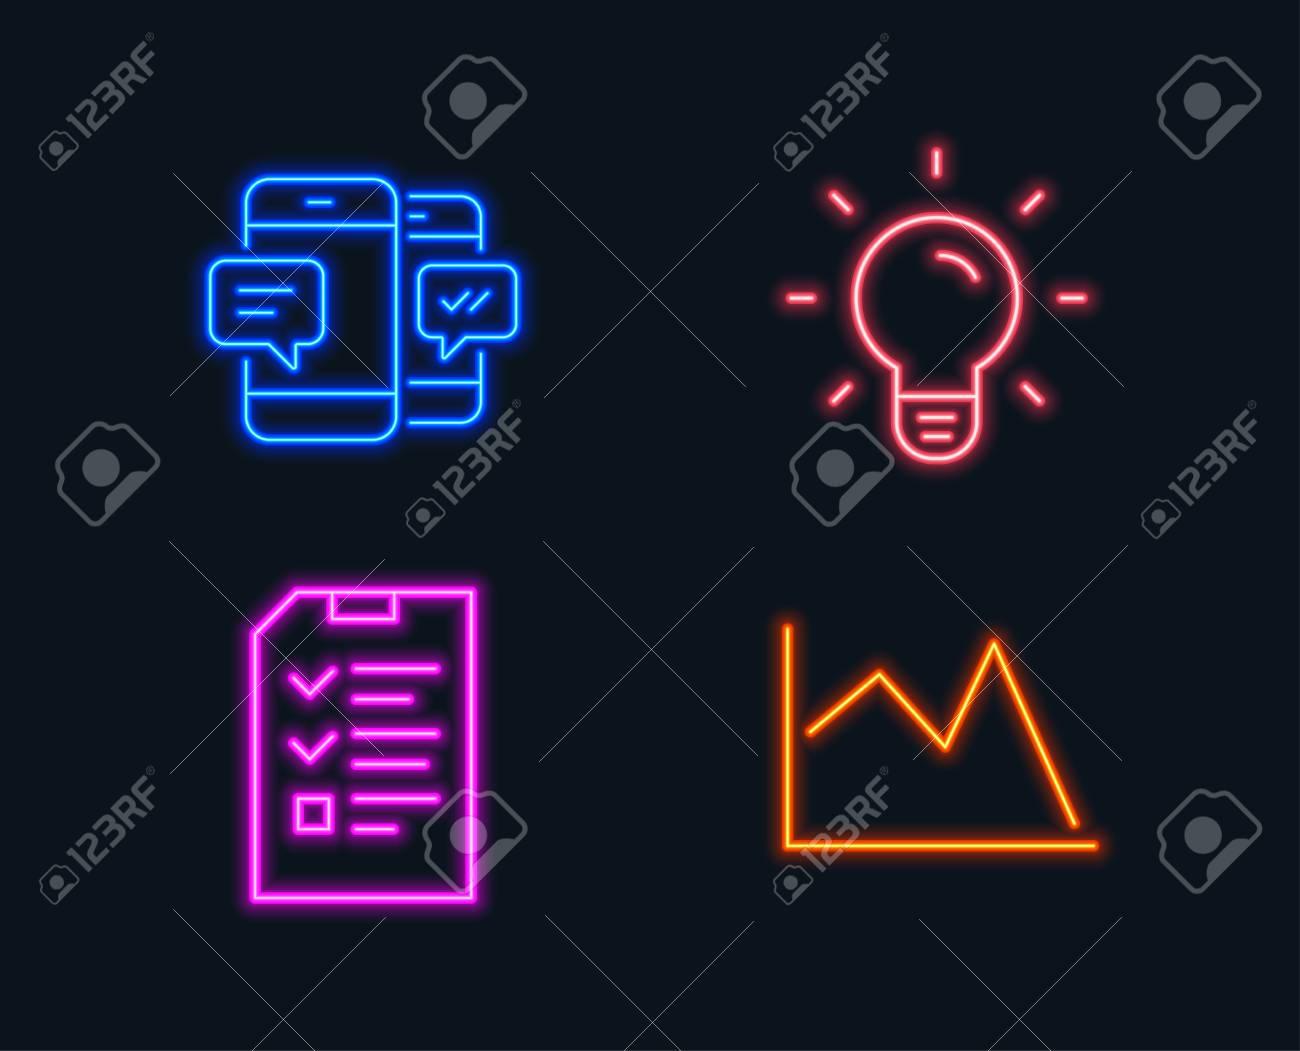 Neon Light Bulbs >> Neon Lights Set Of Light Bulb Smartphone Sms And Interview